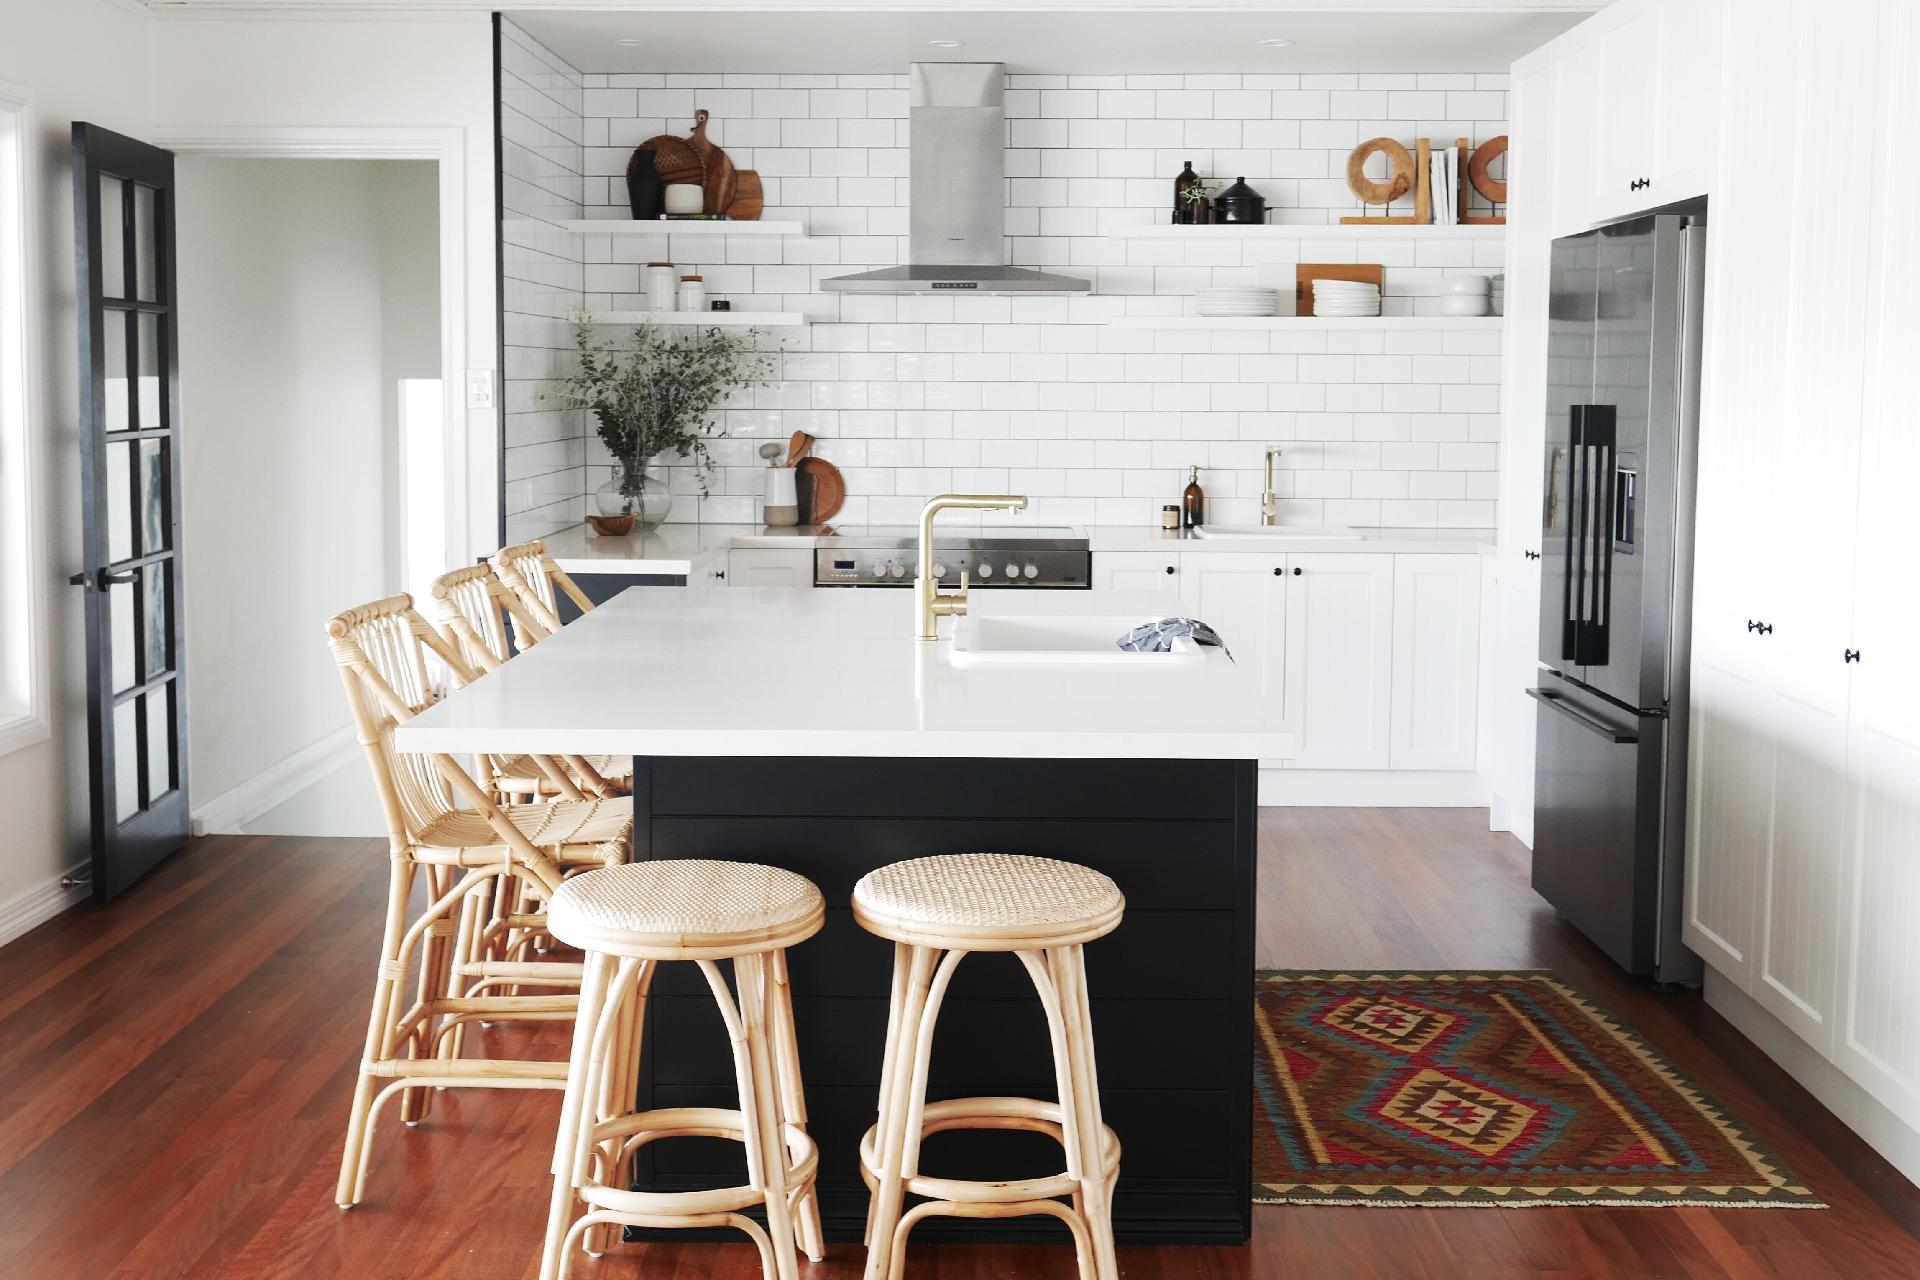 Awe Inspiring Bar Kitchen Stools Naturally Cane Rattan And Wicker Inzonedesignstudio Interior Chair Design Inzonedesignstudiocom